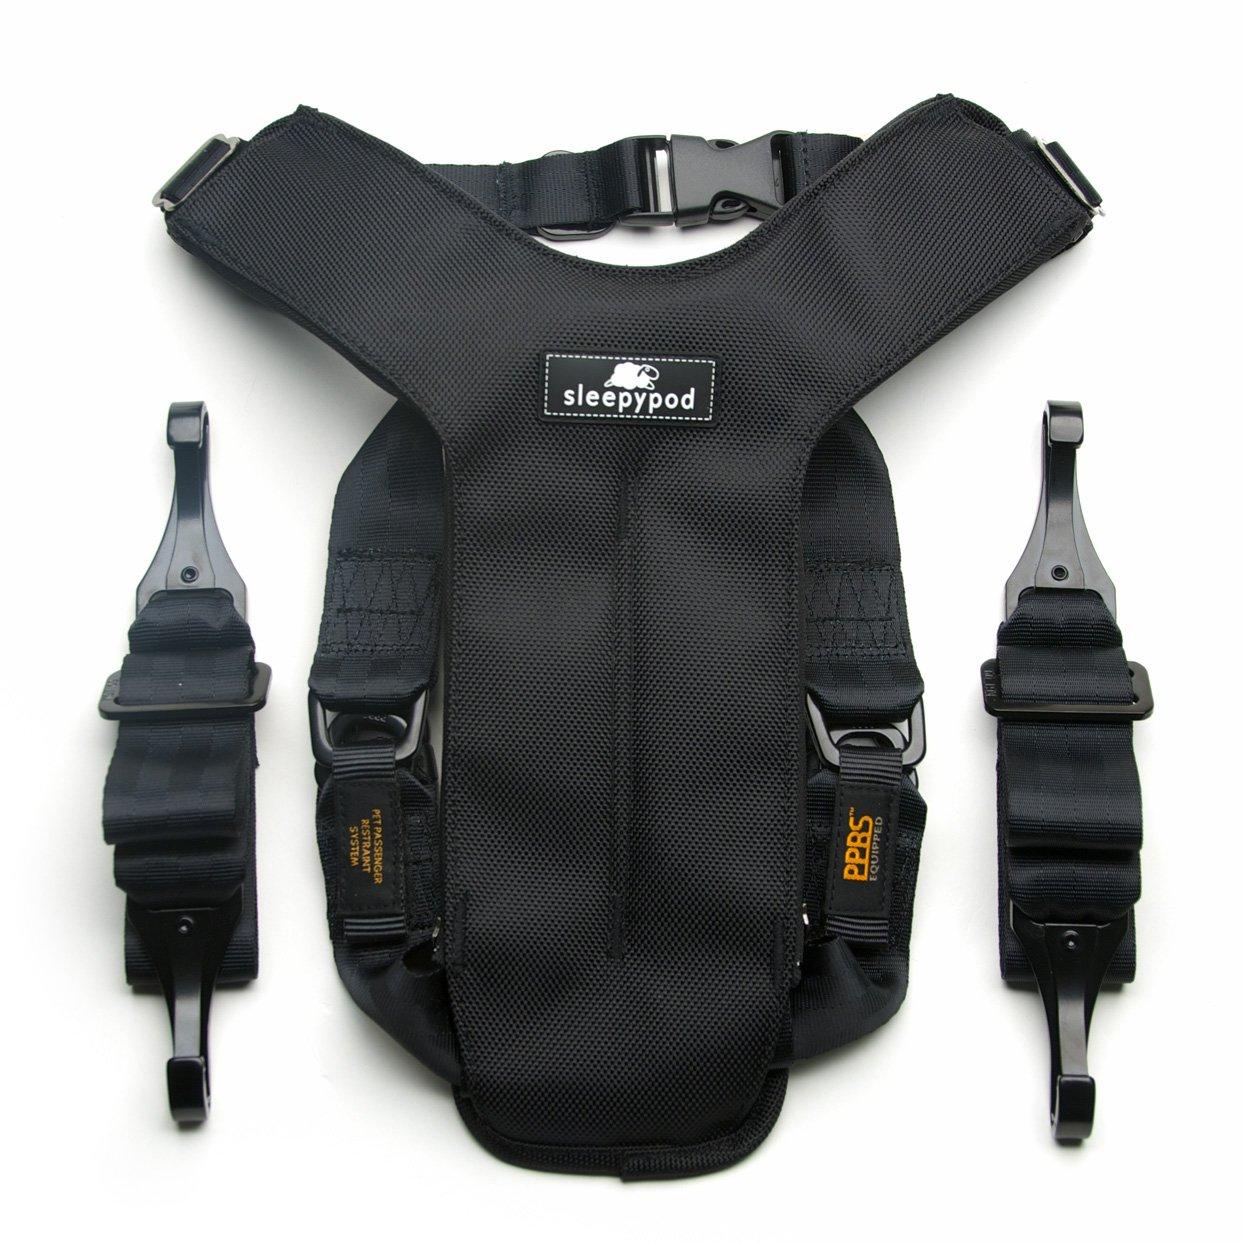 ClickIt Utility Dog Safety Harness - Safest Crash-Tested Car Harness by Sleepypod (Medium, Black)